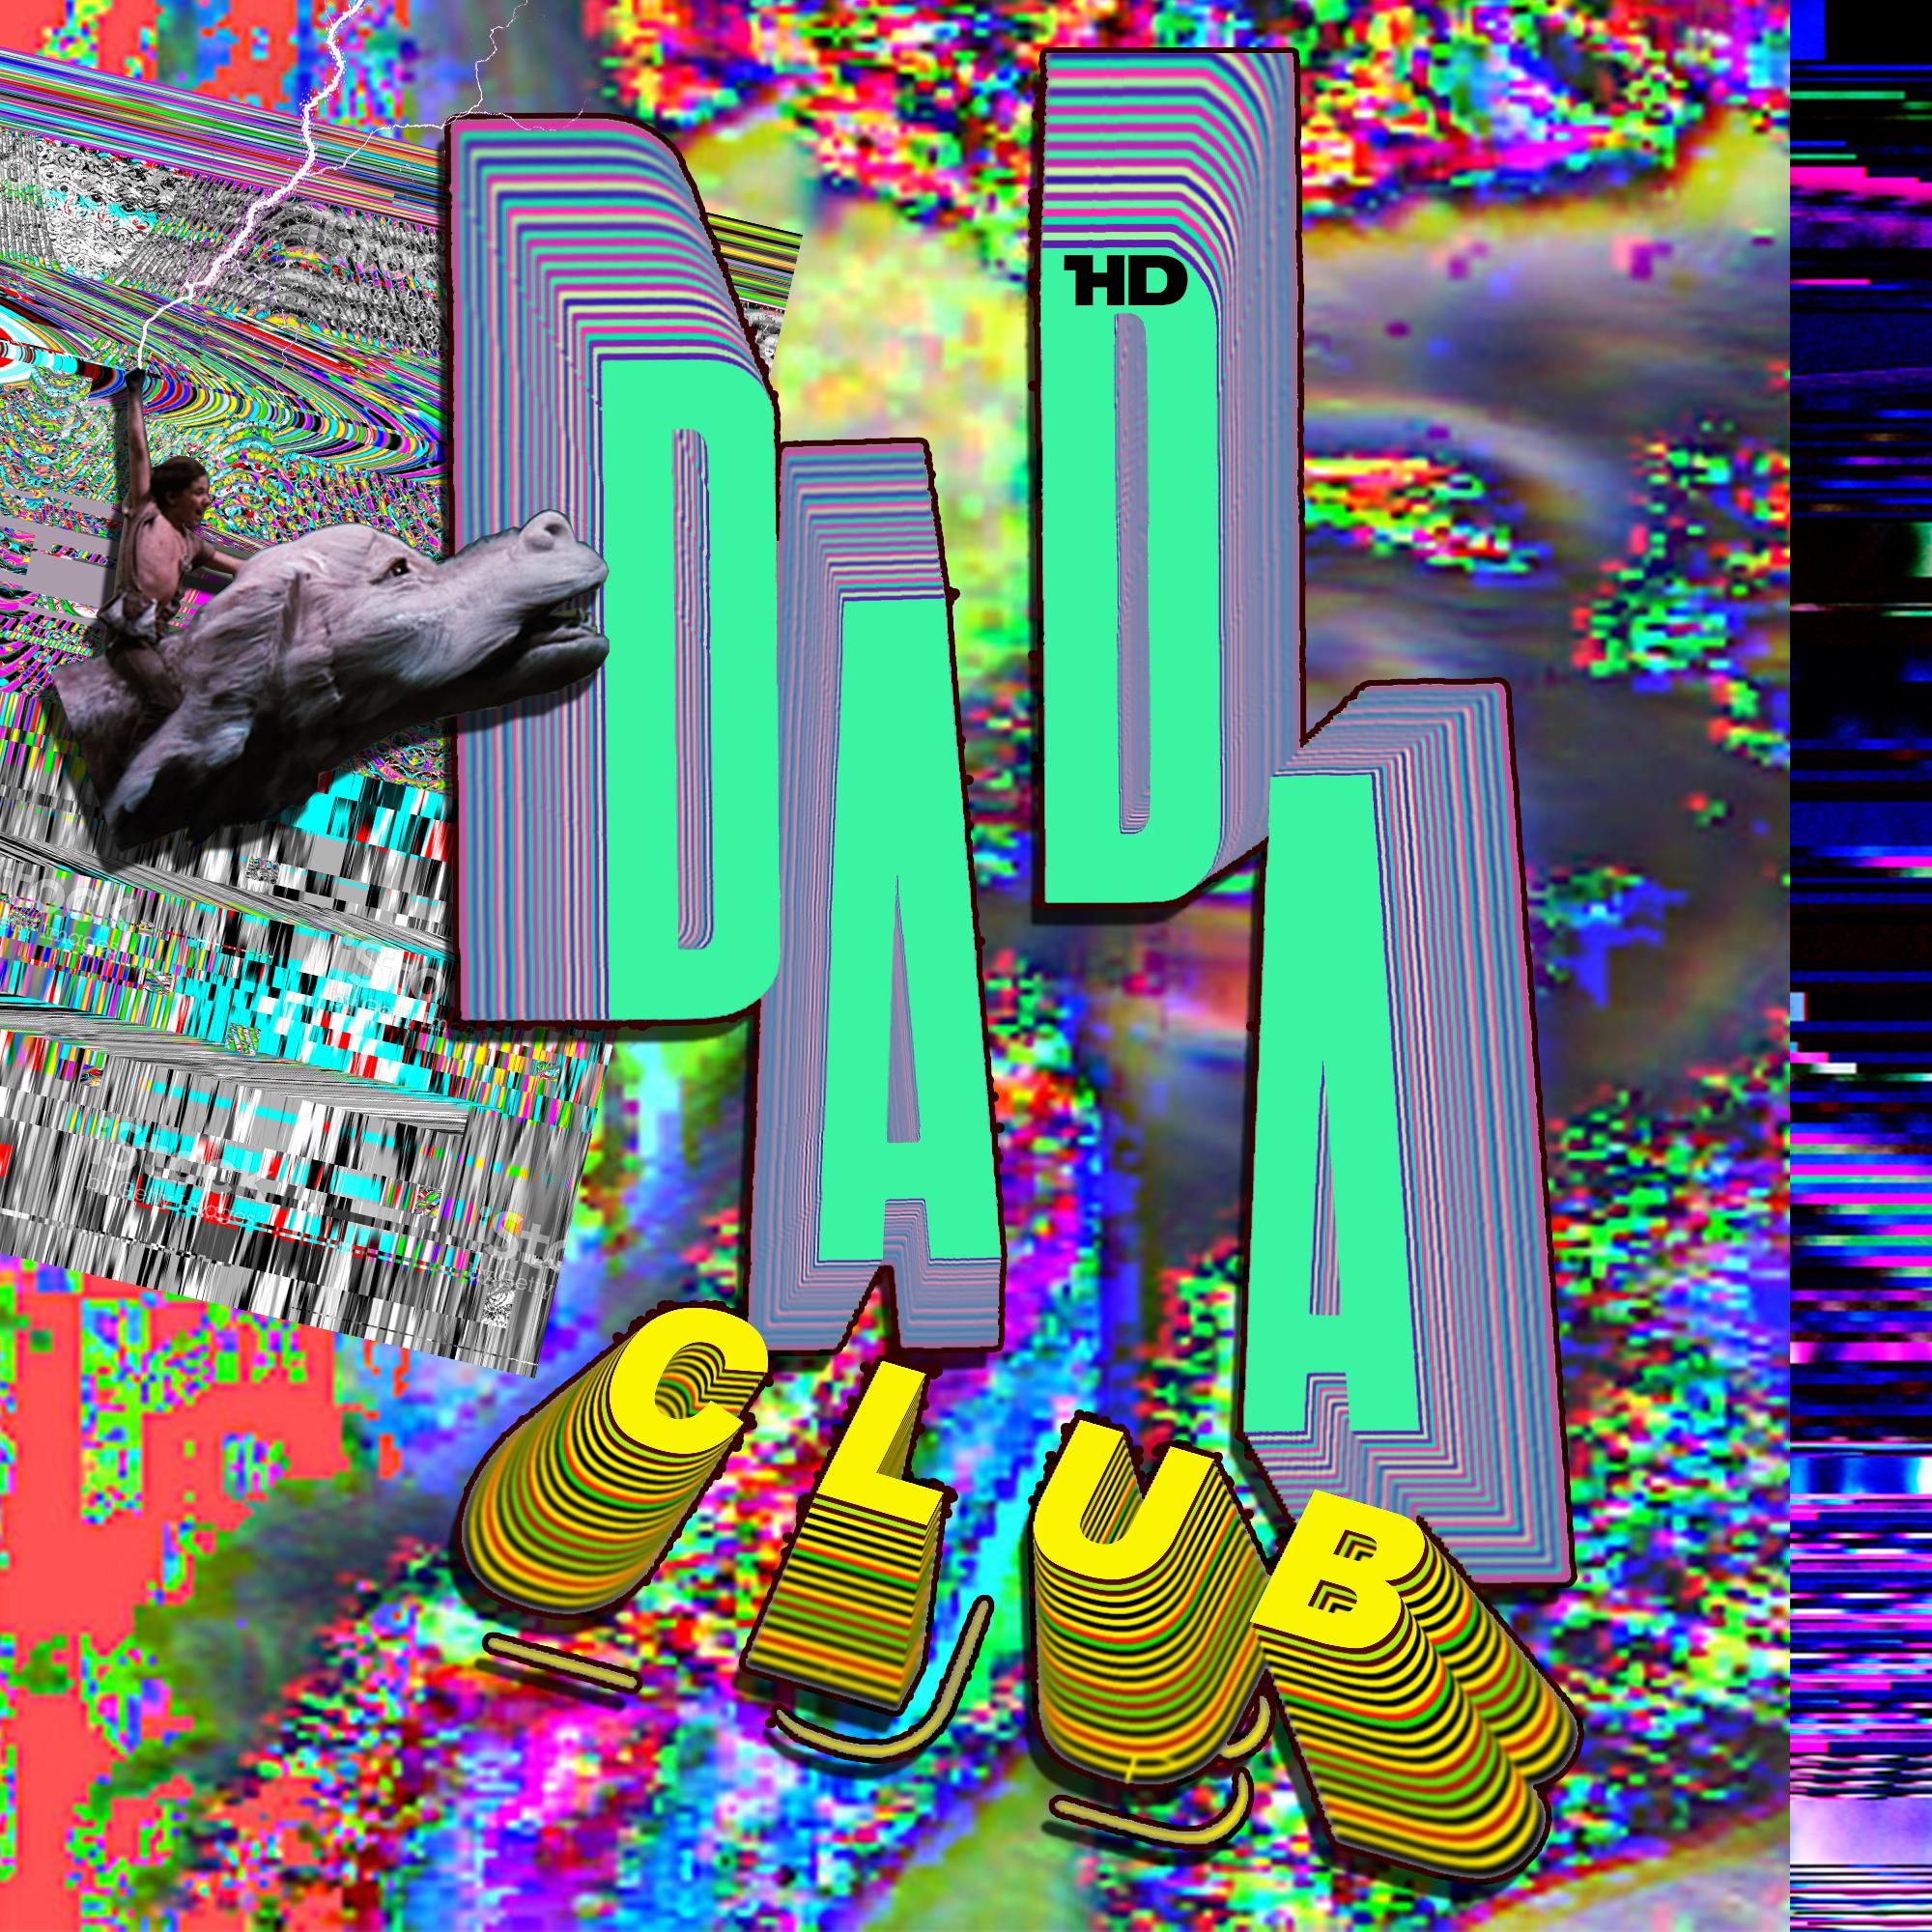 DADA CLUB avec James What, Romain Bno, Mister HaK, Joren & Sato